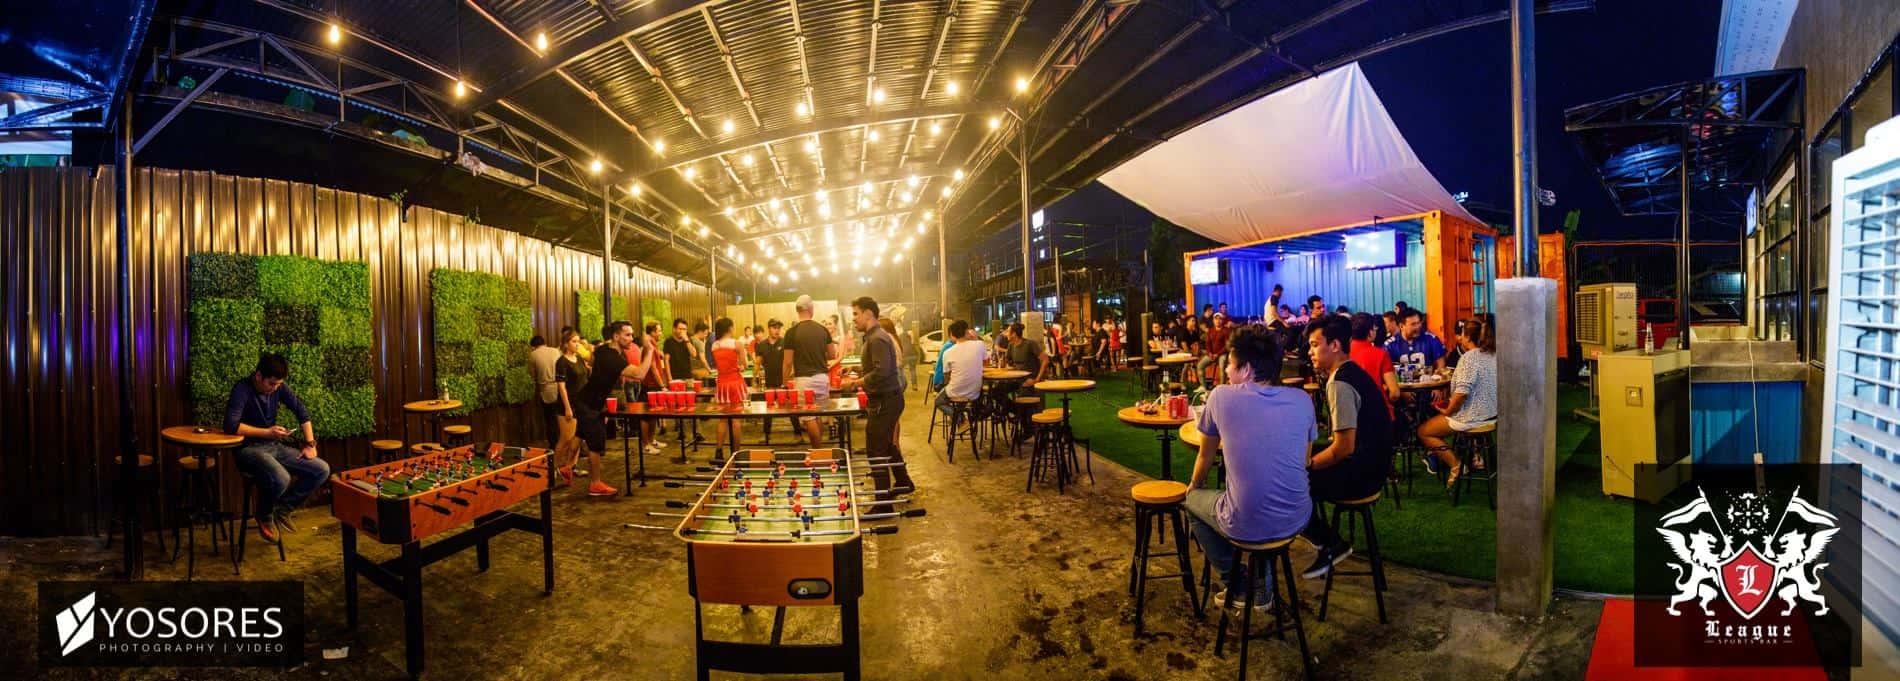 League Sports Bar Cebu (1)